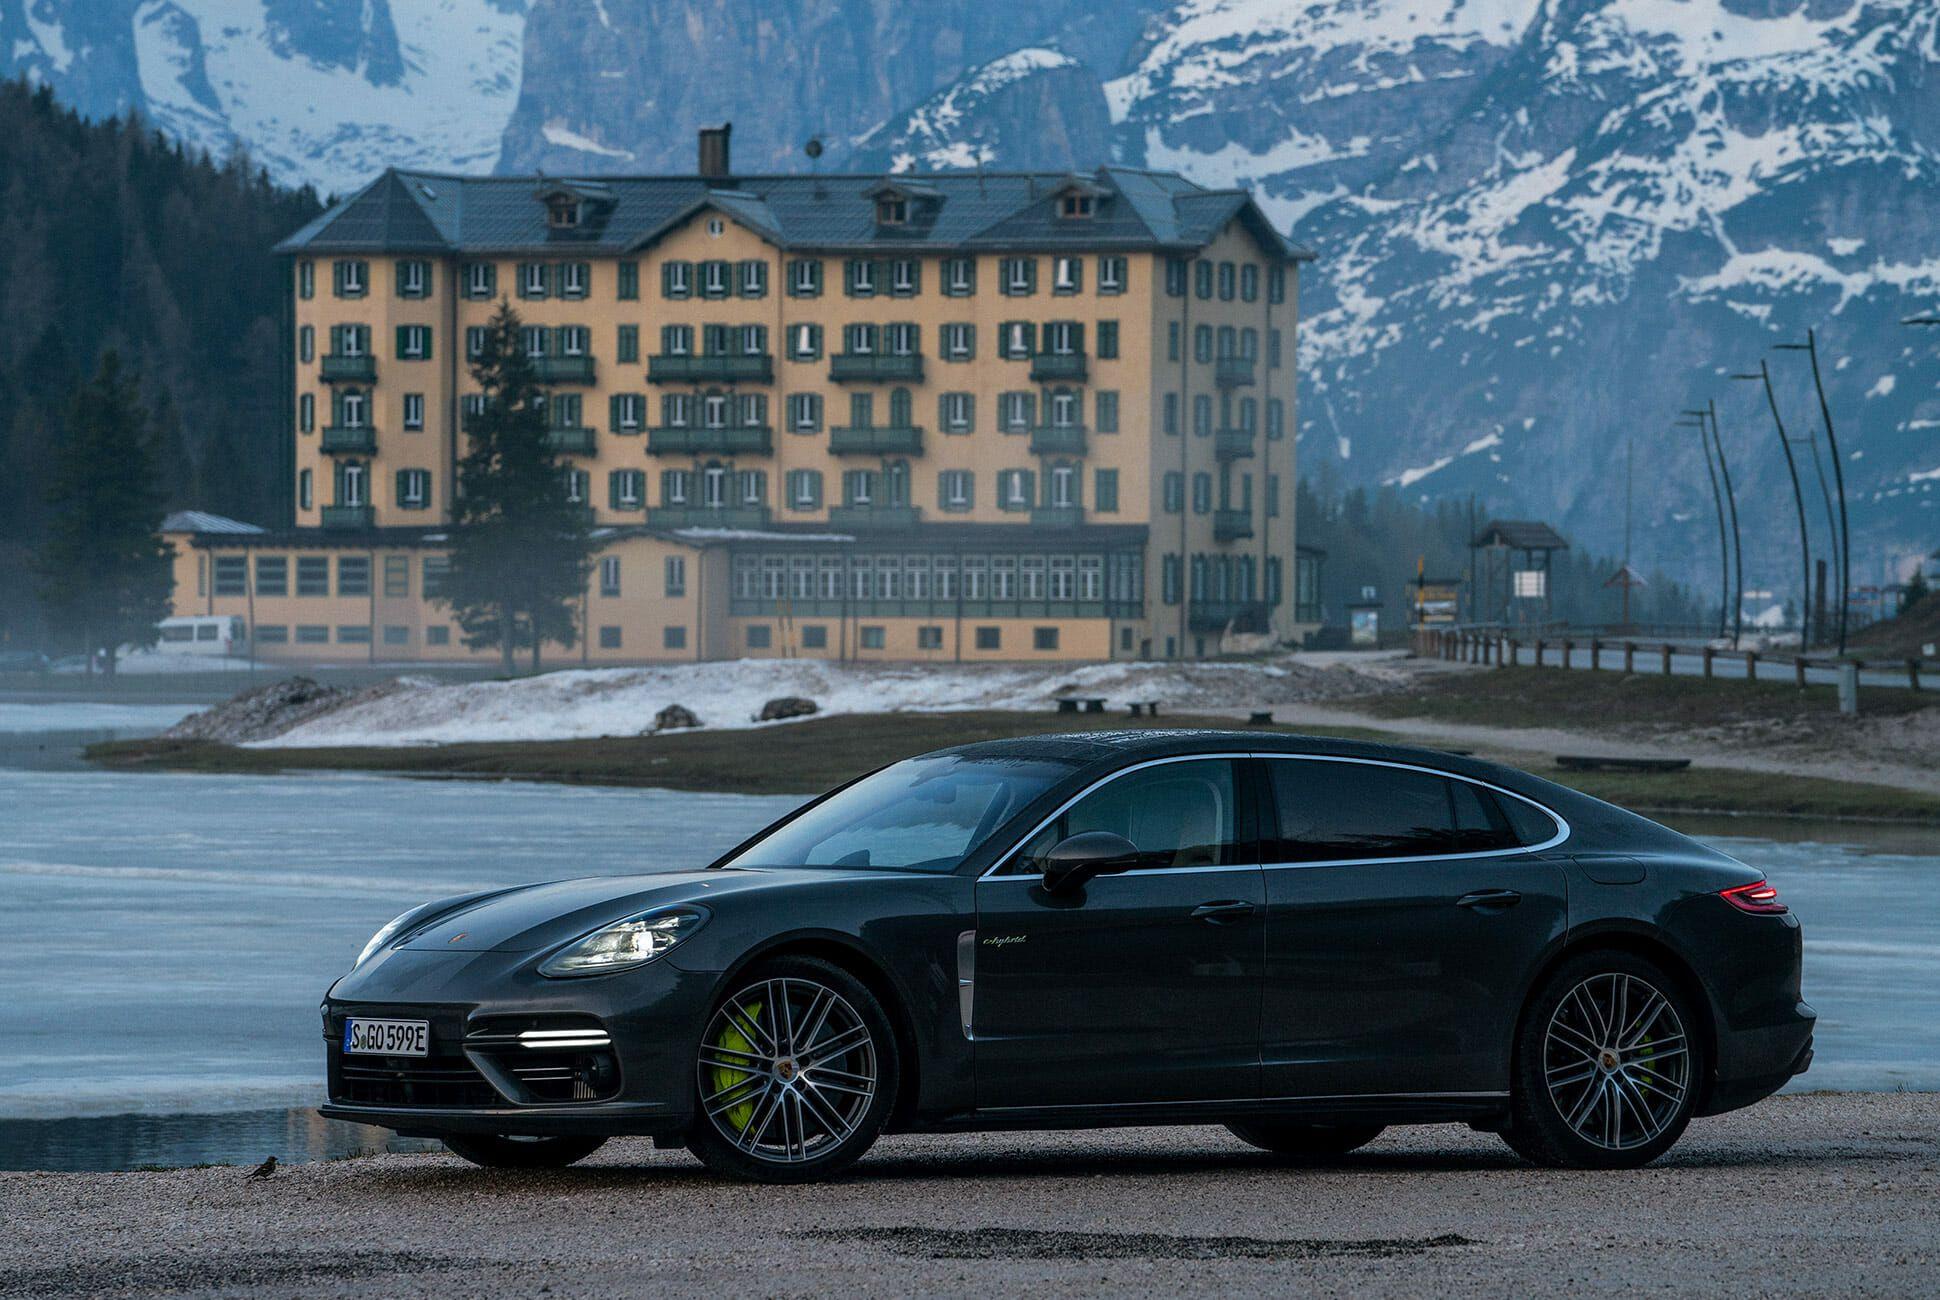 Porsche-Panamera-Executive-Review-gear-patrol-slide-1